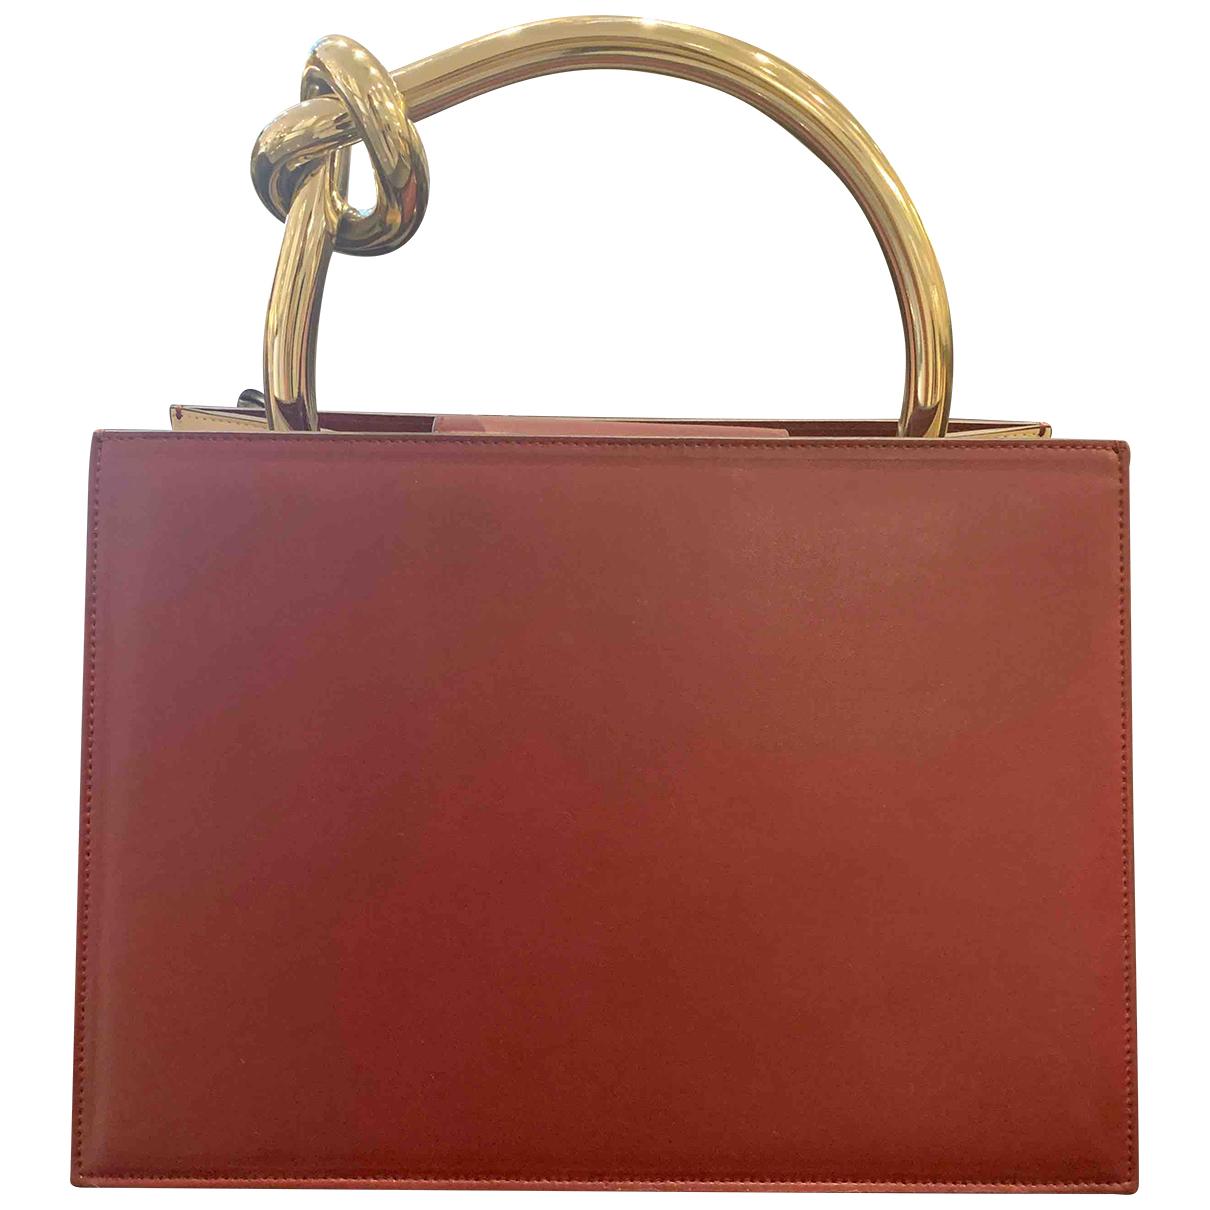 Benedetta Bruzziches N Burgundy Leather handbag for Women N